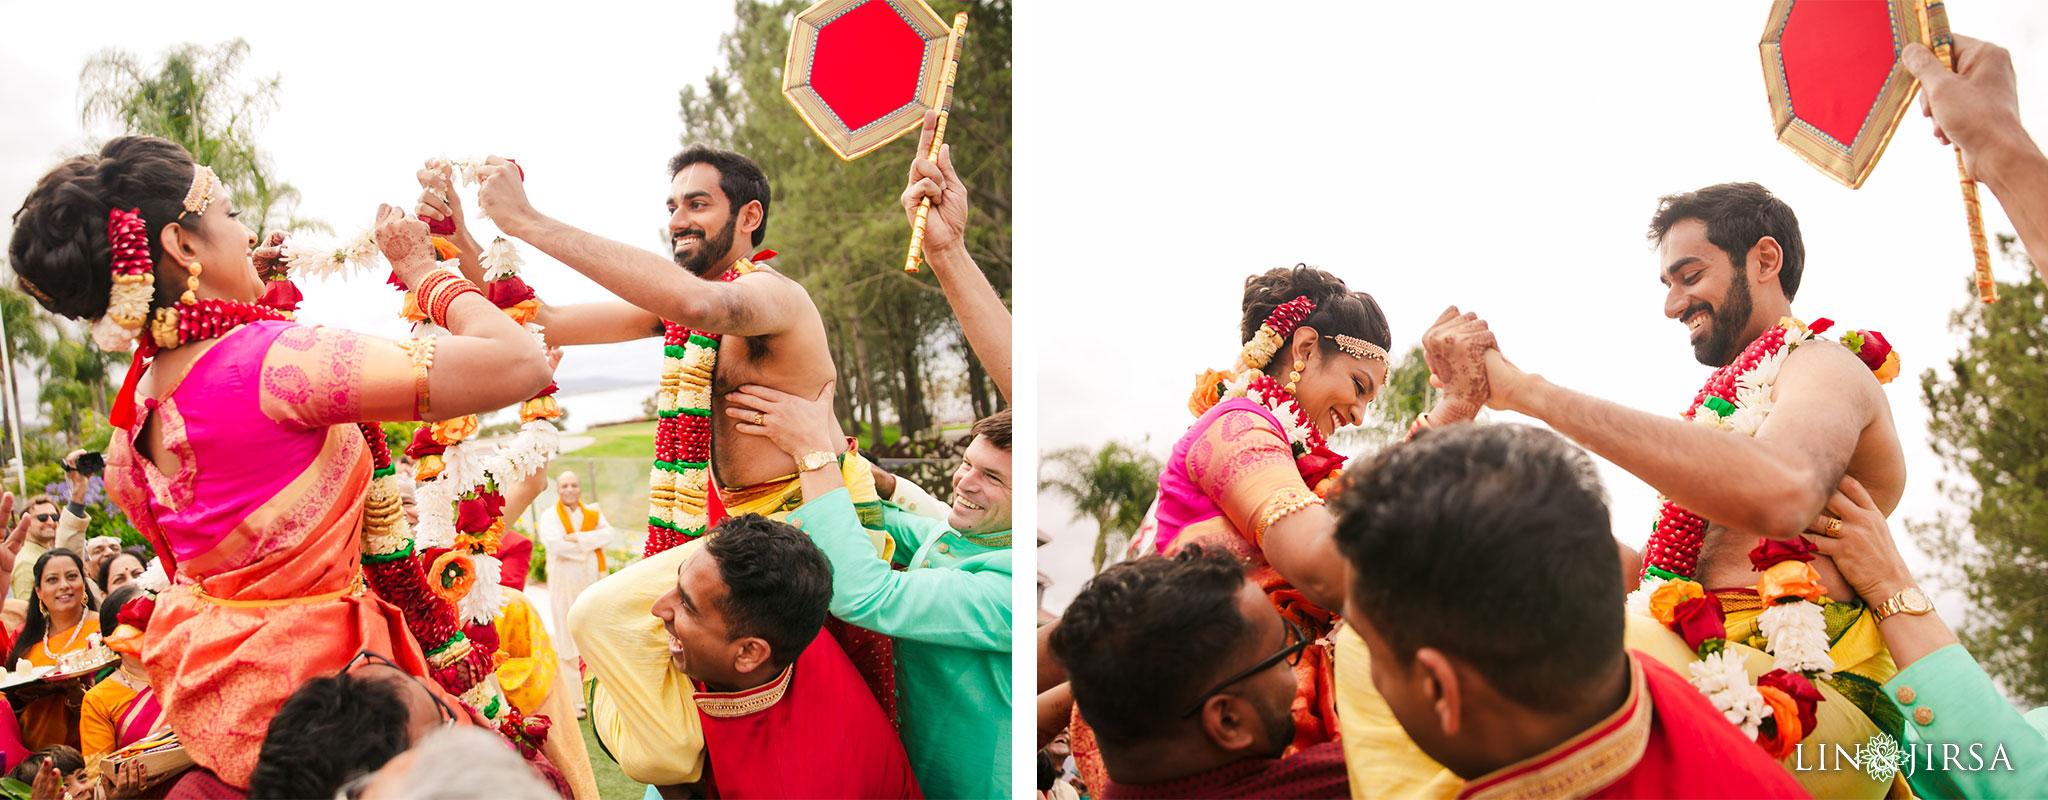 12 laguna cliffs marriott dana point indian wedding ceremony photography